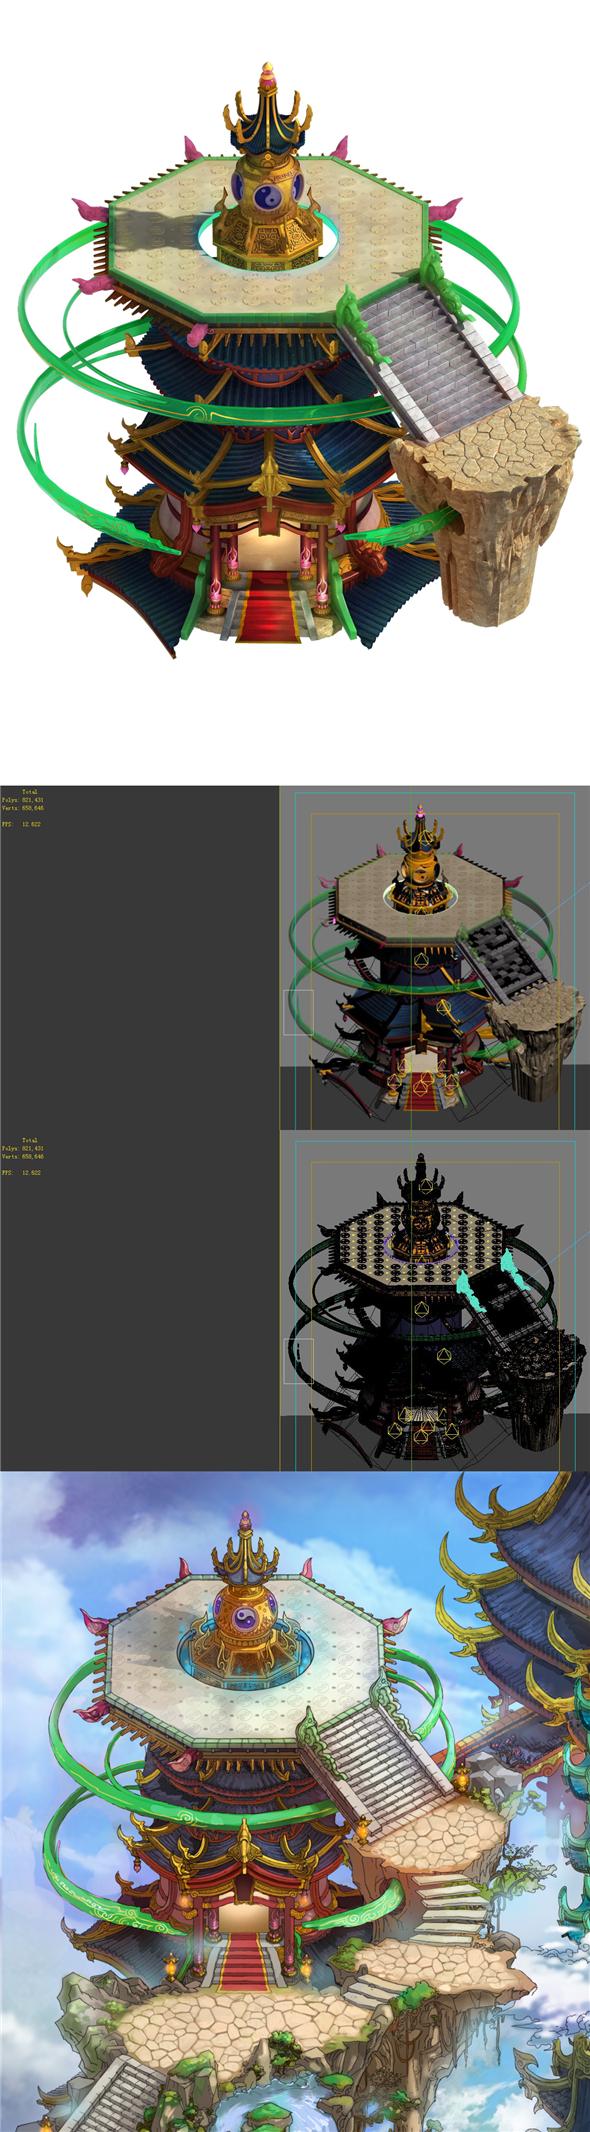 Game model - Bi La City - Palace sightseeing platform - 3DOcean Item for Sale